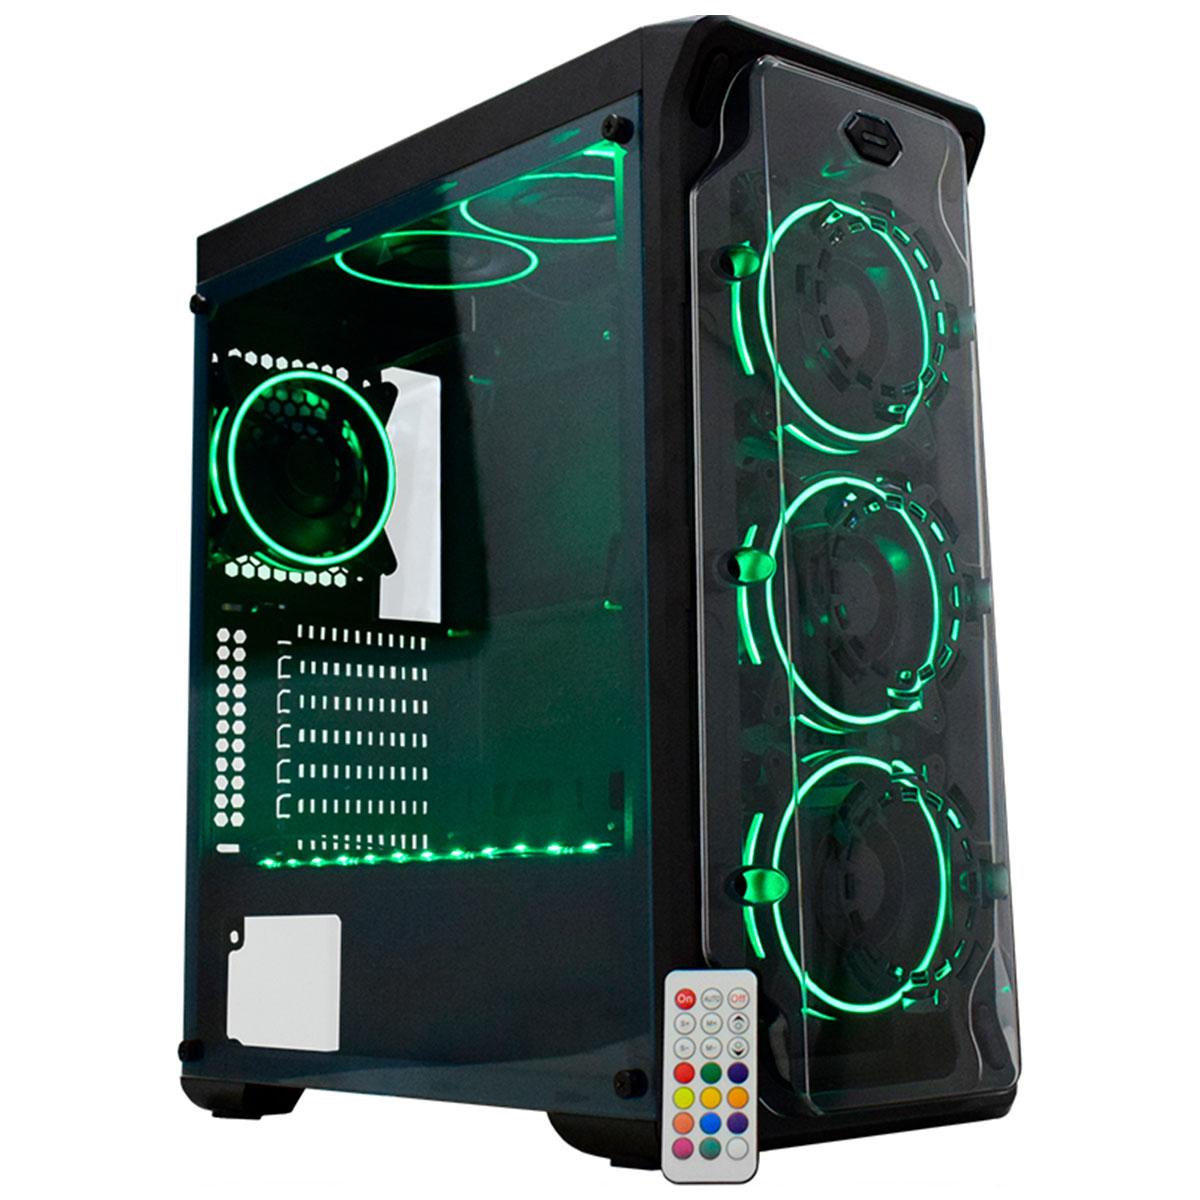 Gabinete Gamer K-MEX Dark Trooper CG-01B1 3 Fans RGB + Fita LED - CG01B1RH0010B0X - Preto